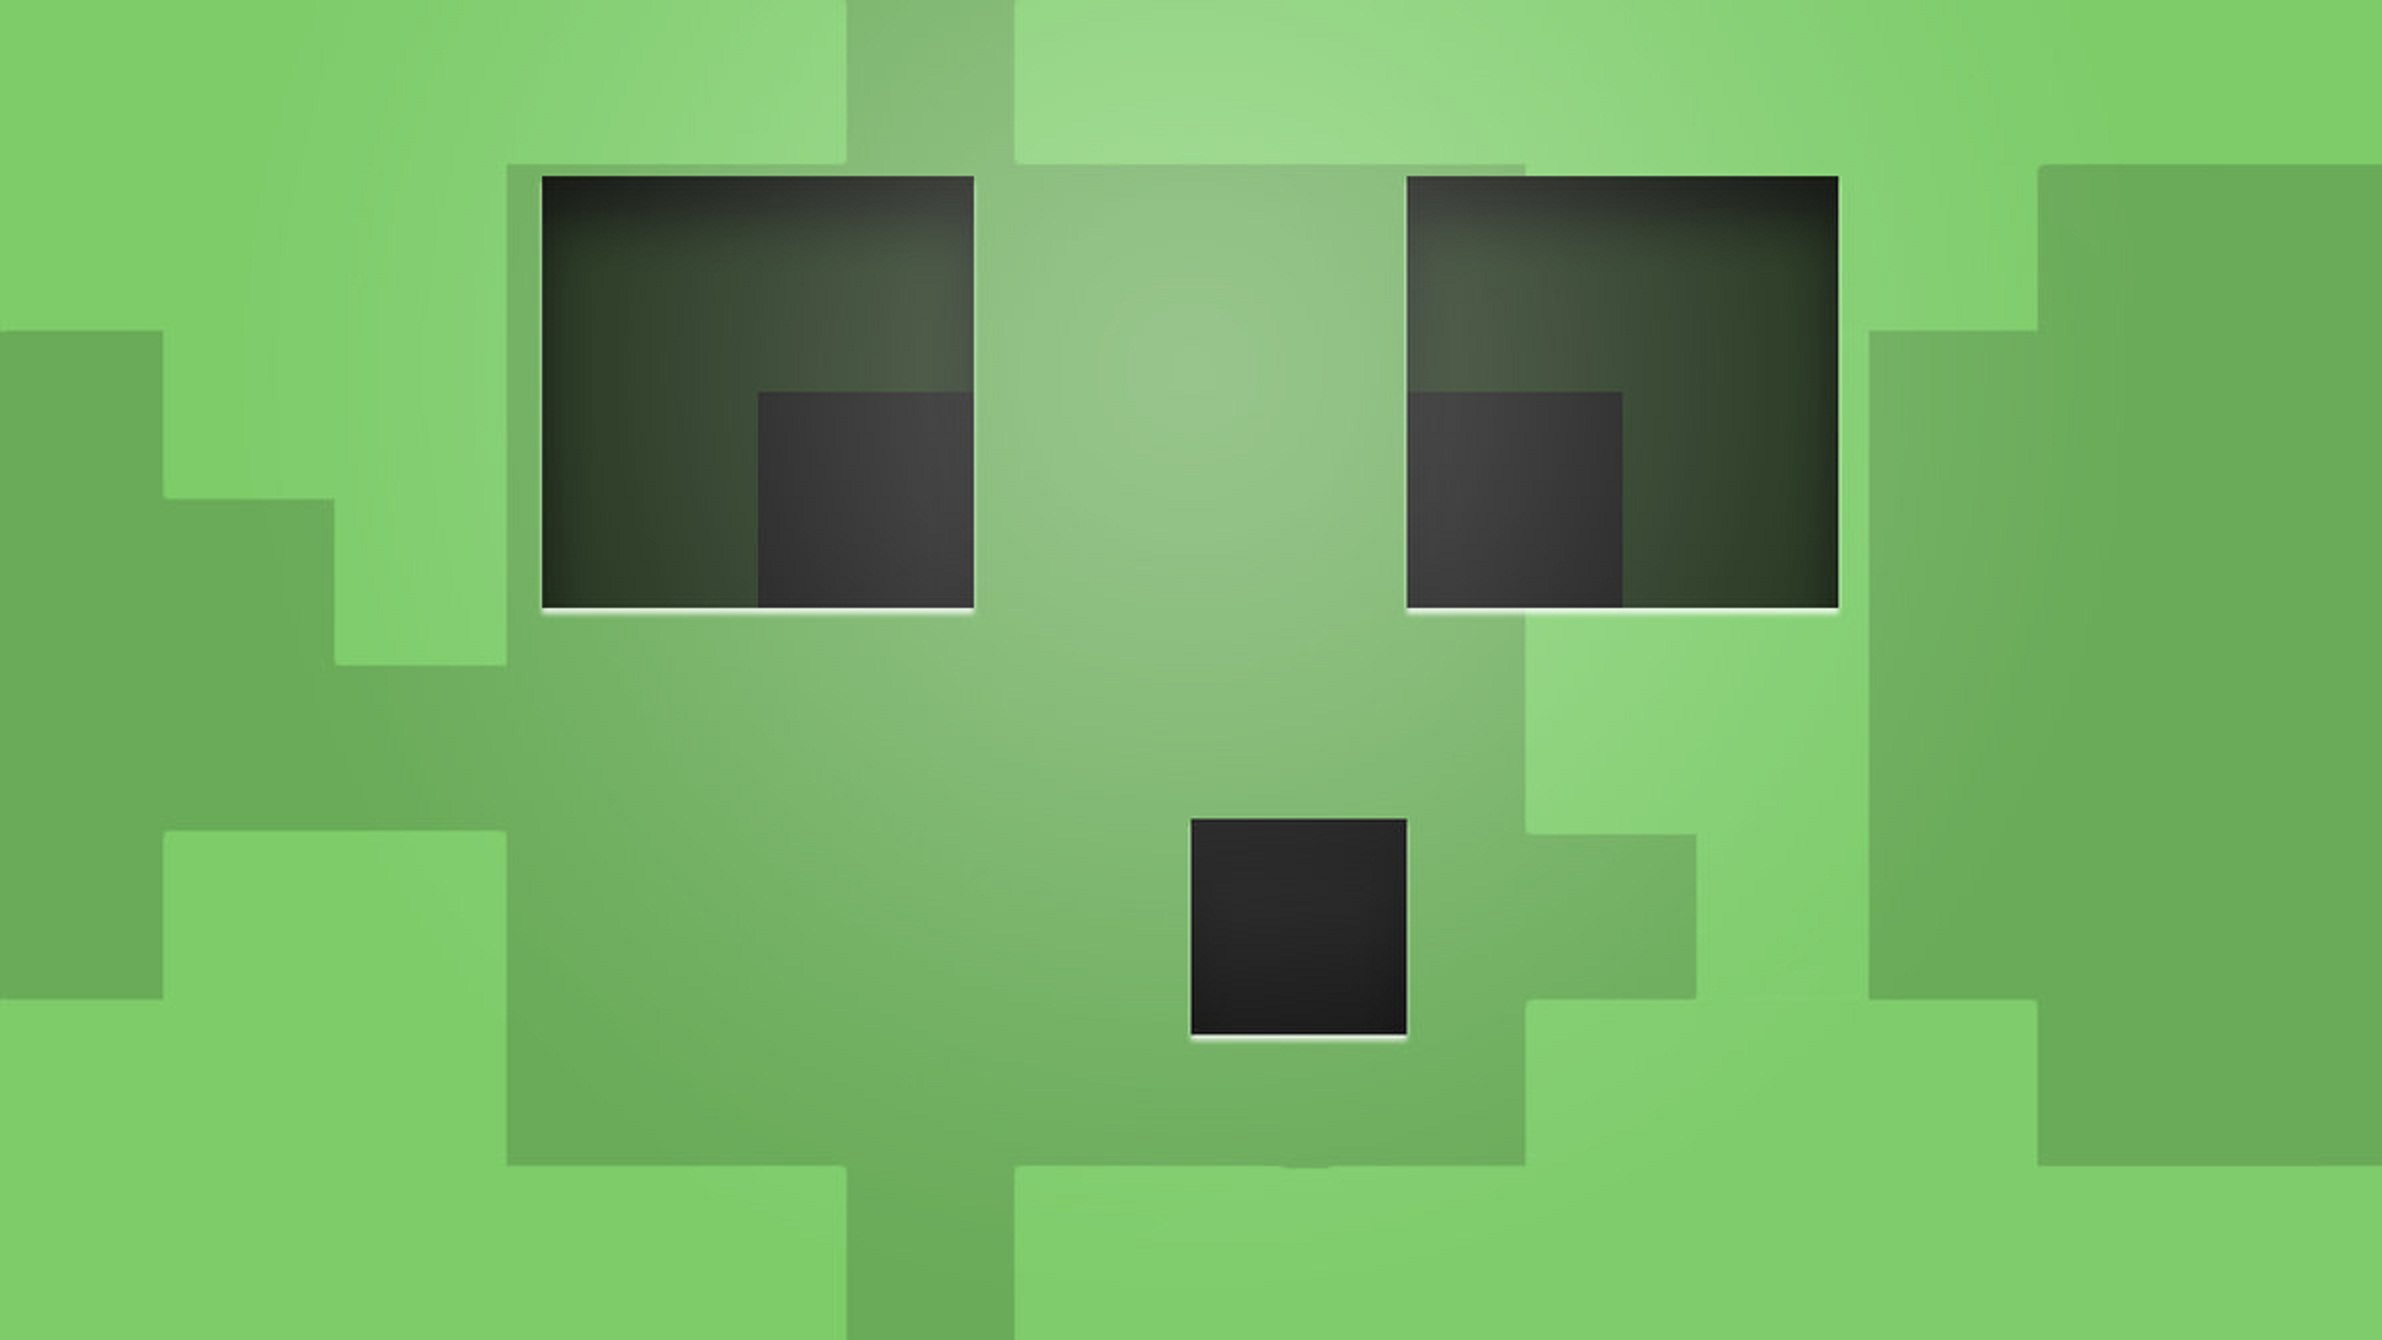 Free Download Minecraft Wallpaper Slime Wallpaper